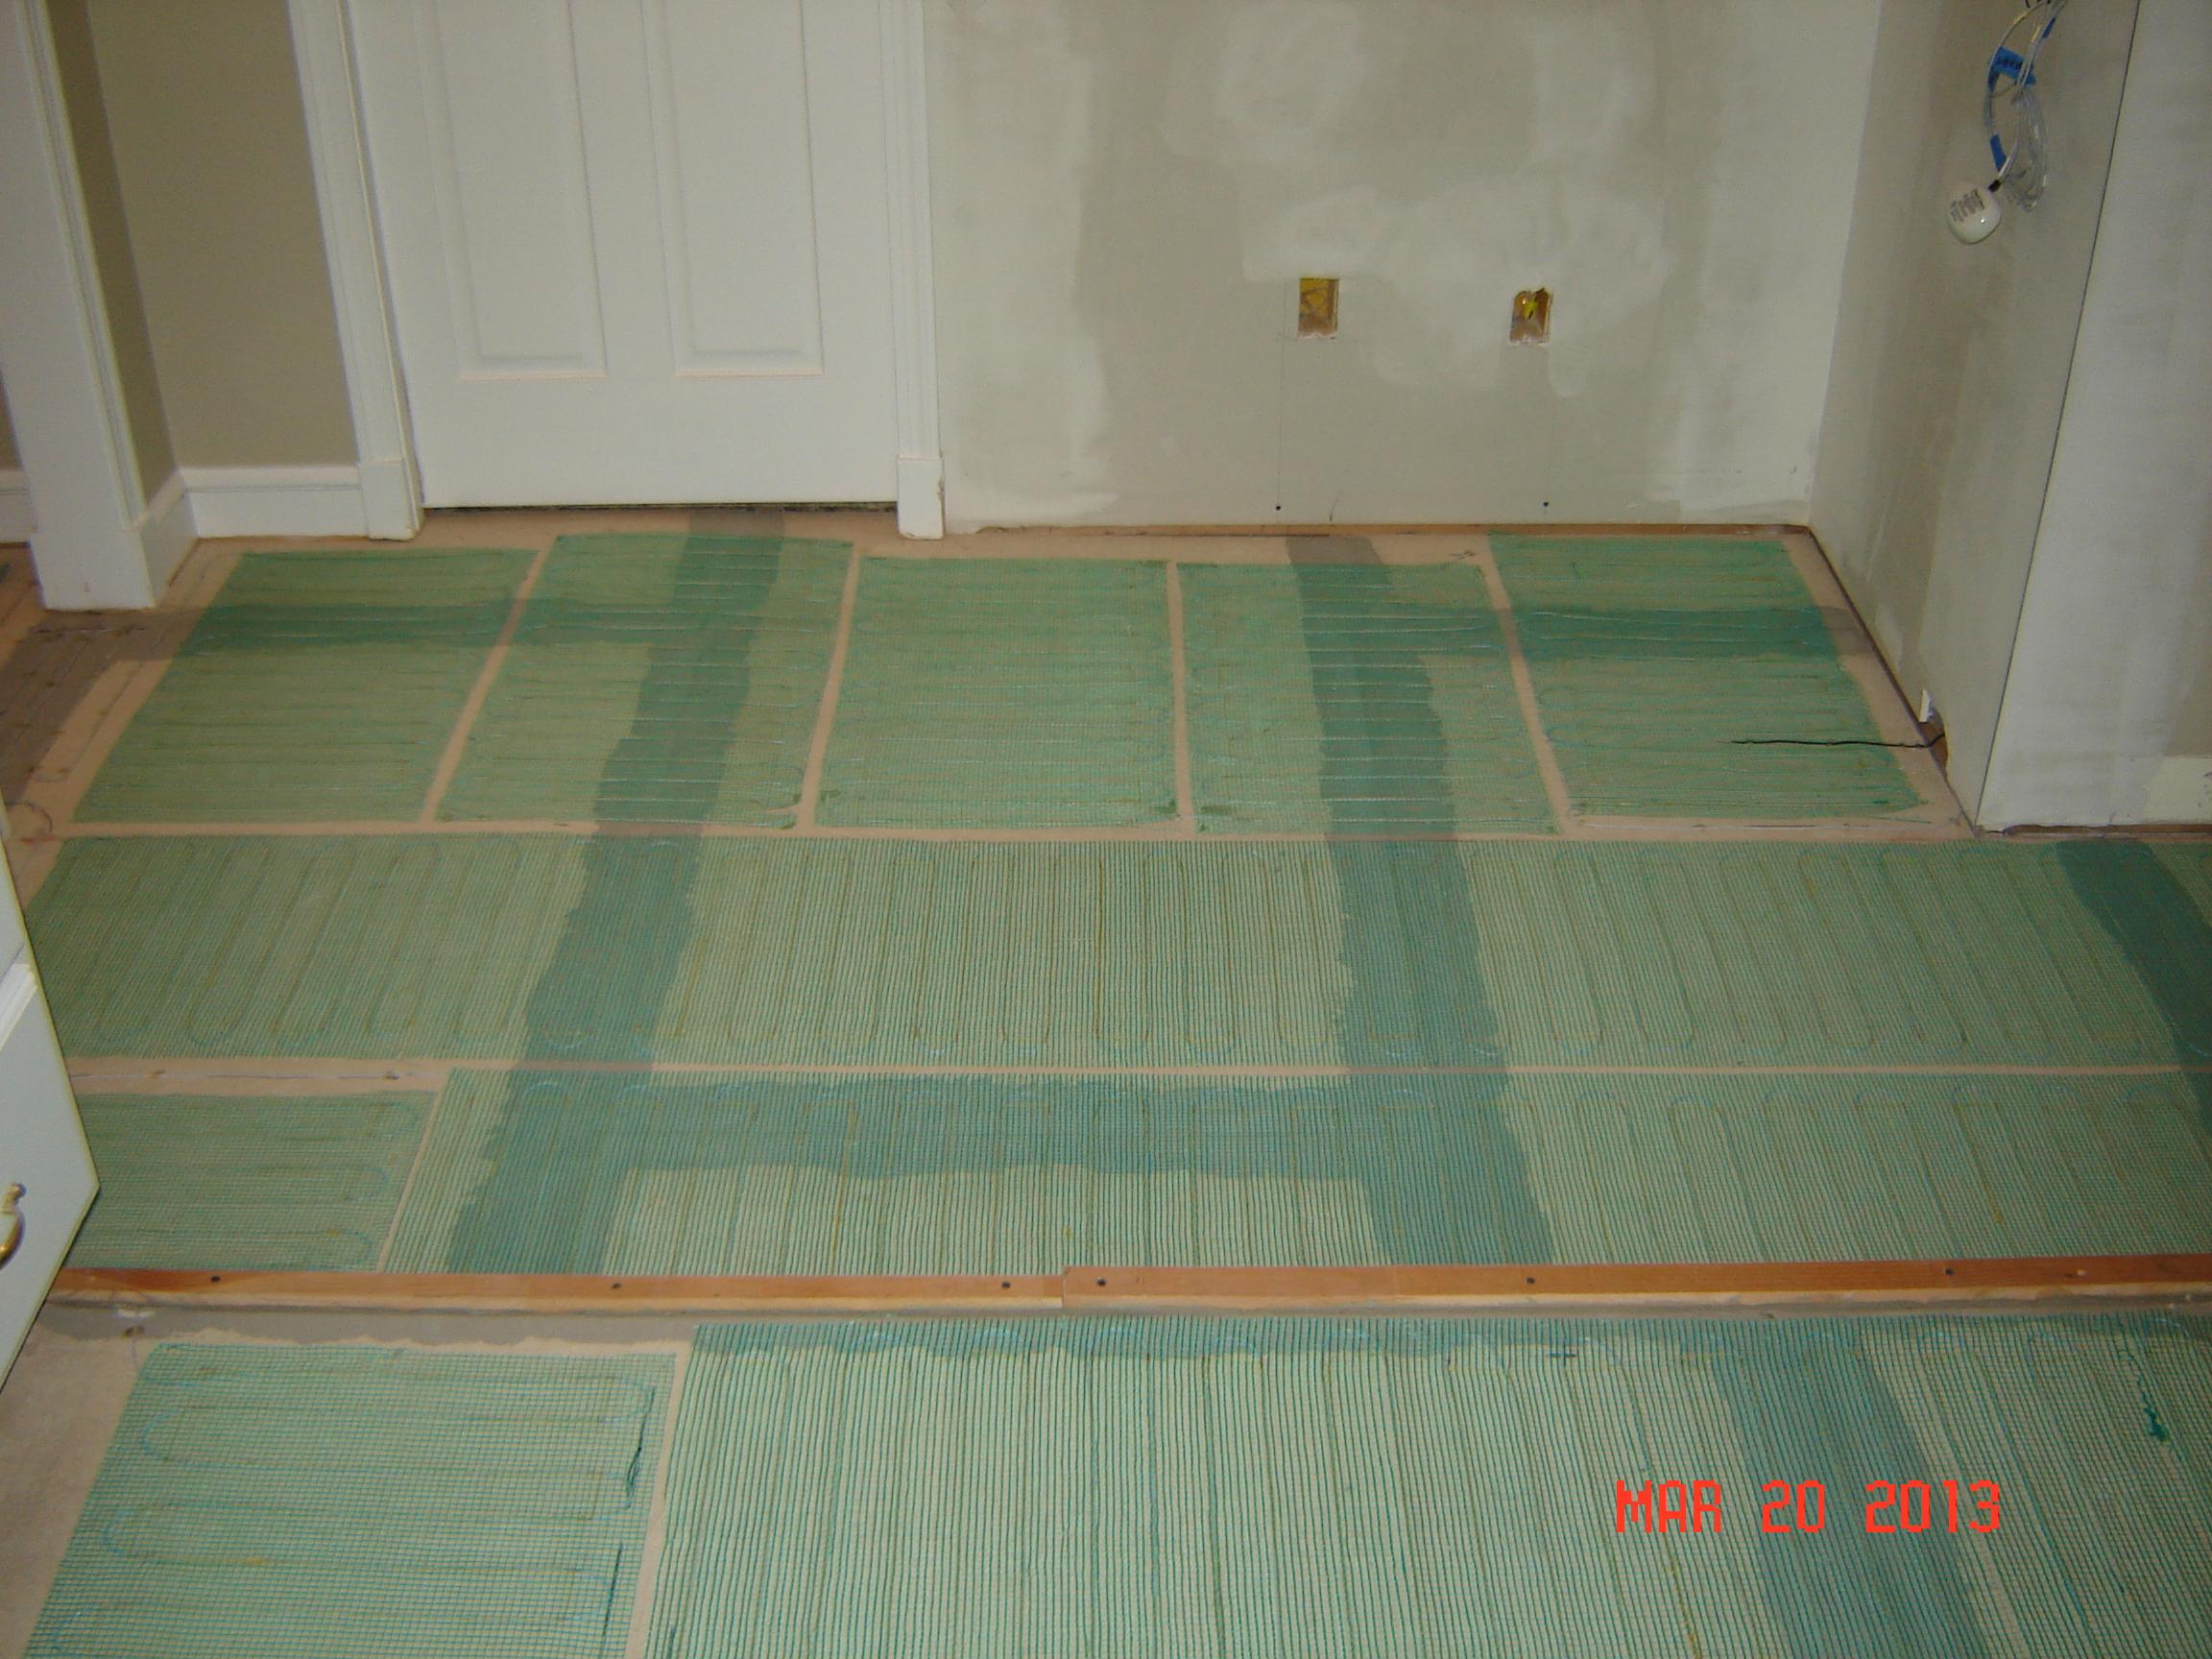 heated floor being installed